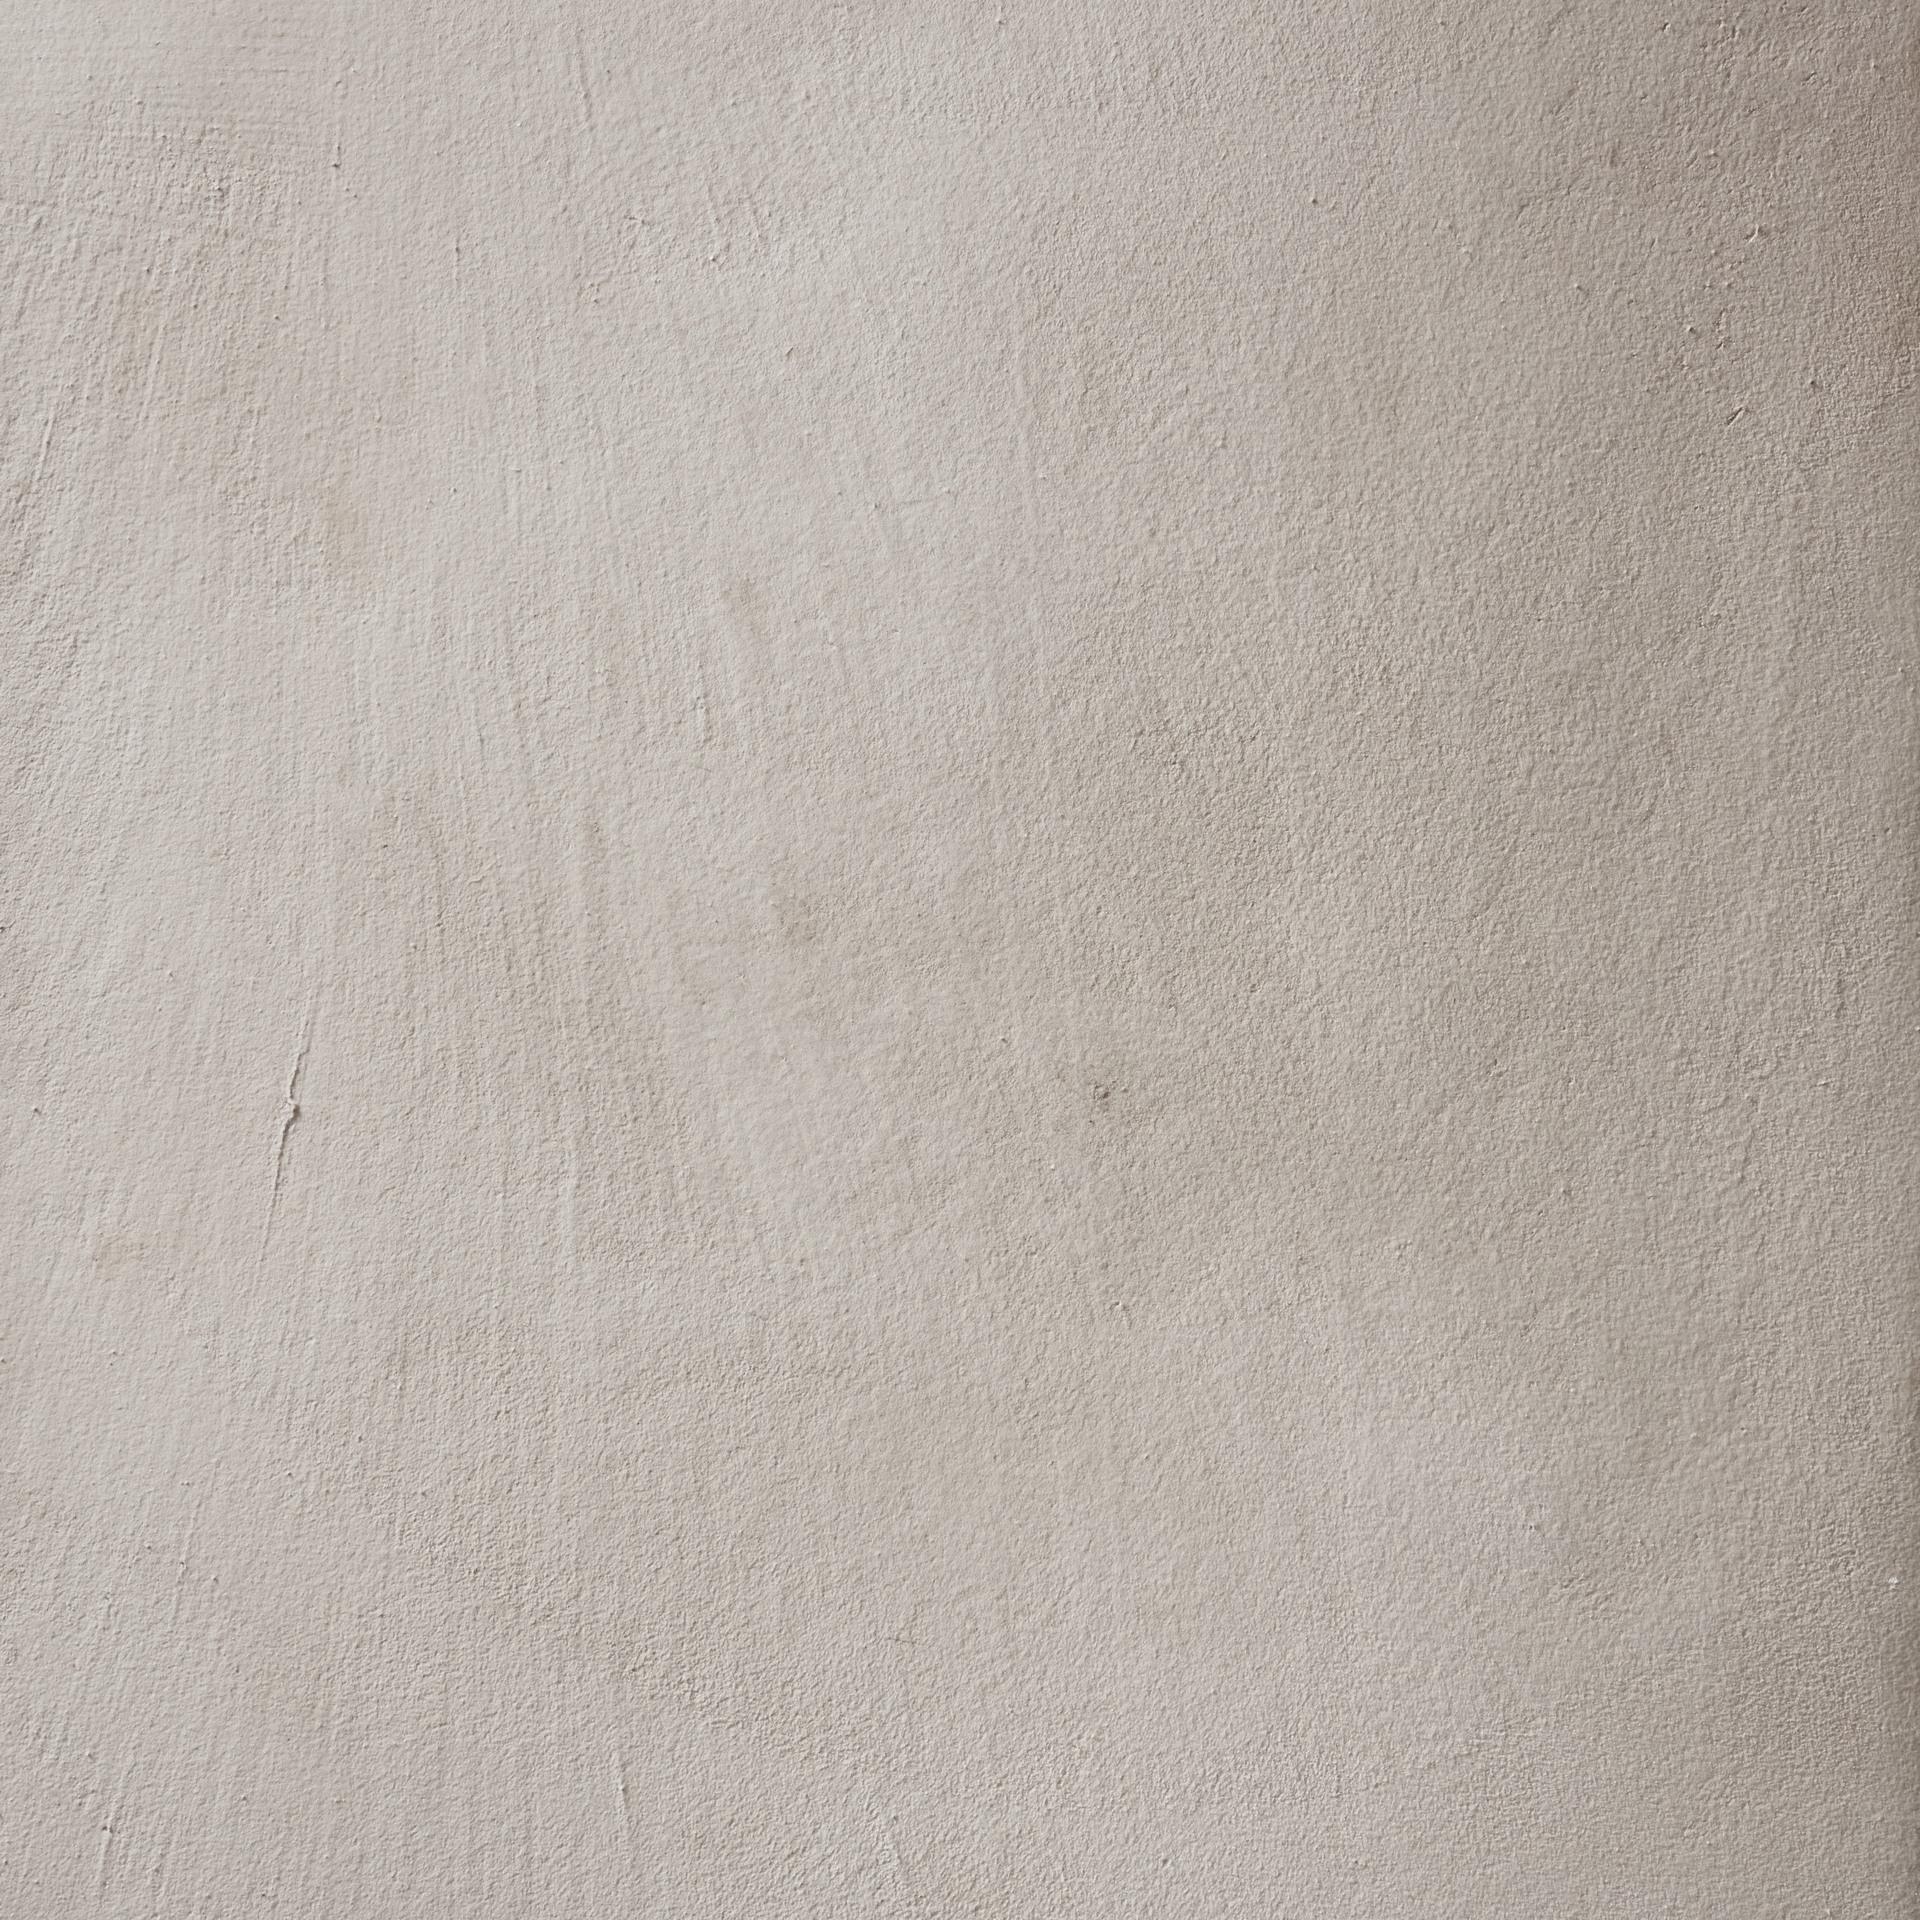 Material TerraTon Floor - Mineral Waterproof Plaster for Horizontal Surfaces | Matter of Stuff